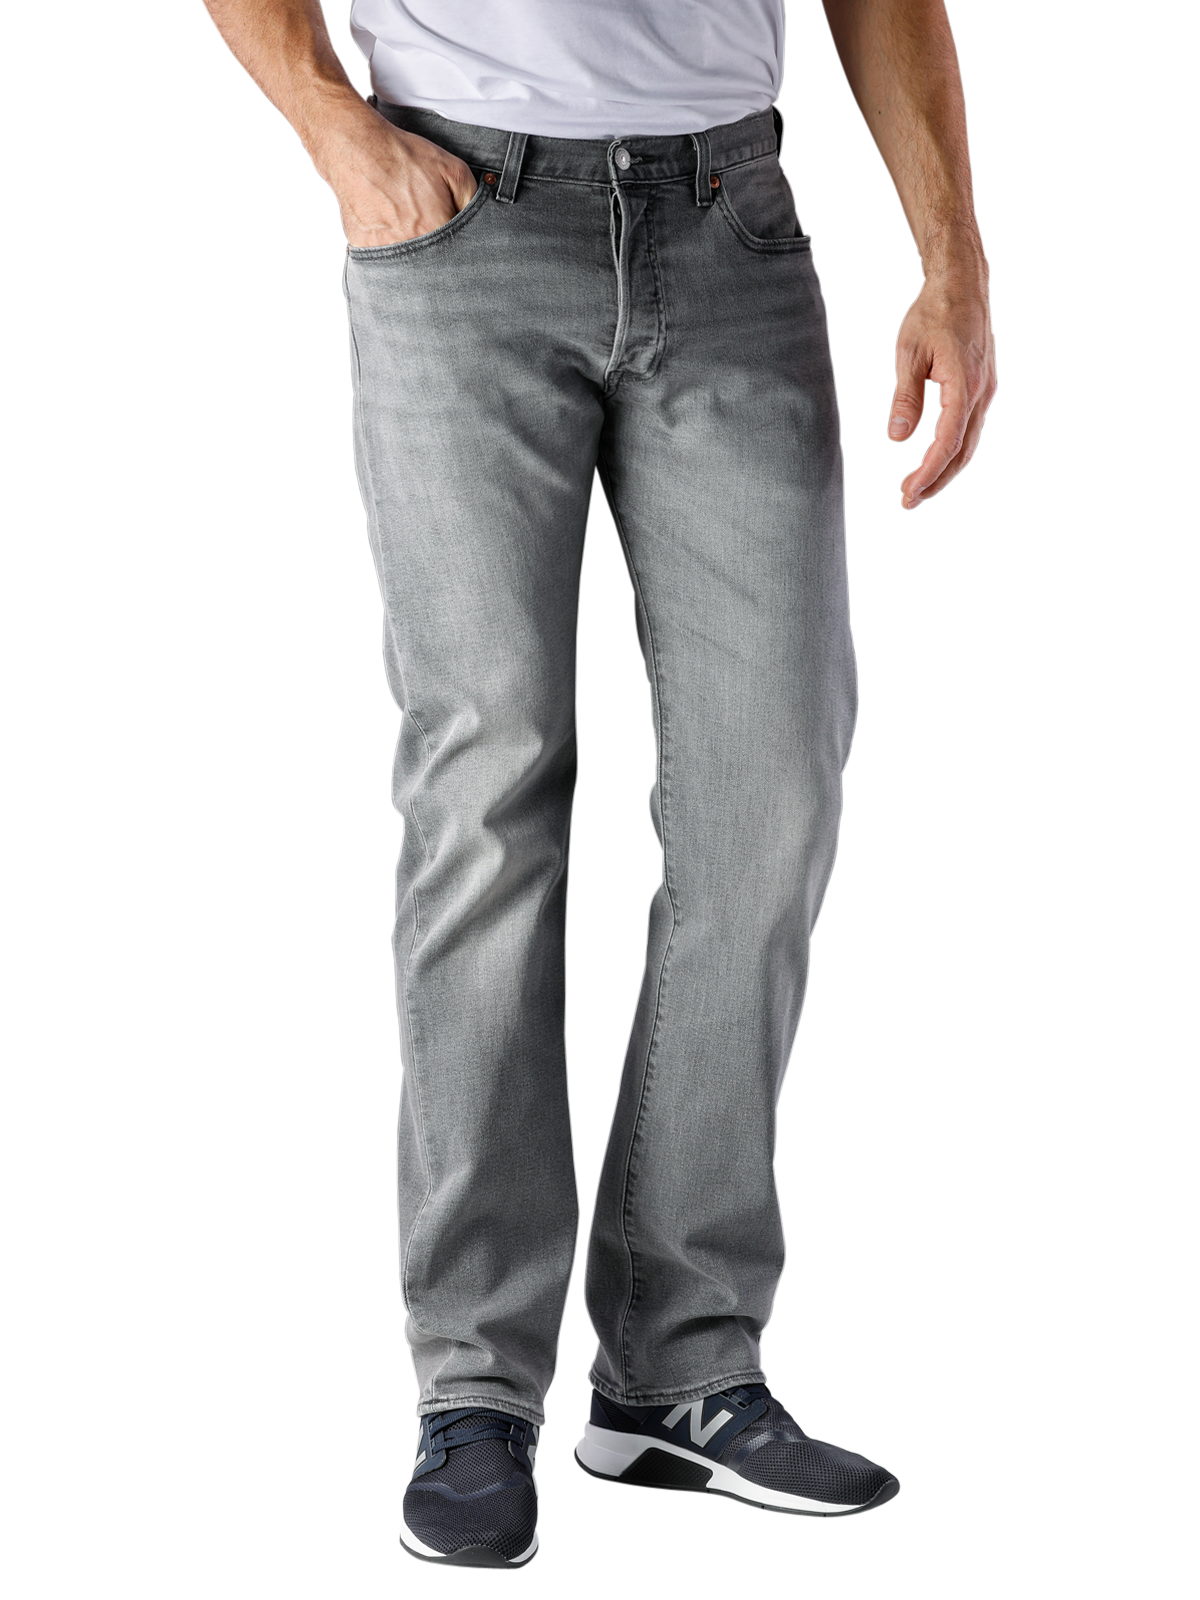 Levi's 501 Jeans Original Fit high water tnl | Gratis ... - Levi Strauss 501 Jeans